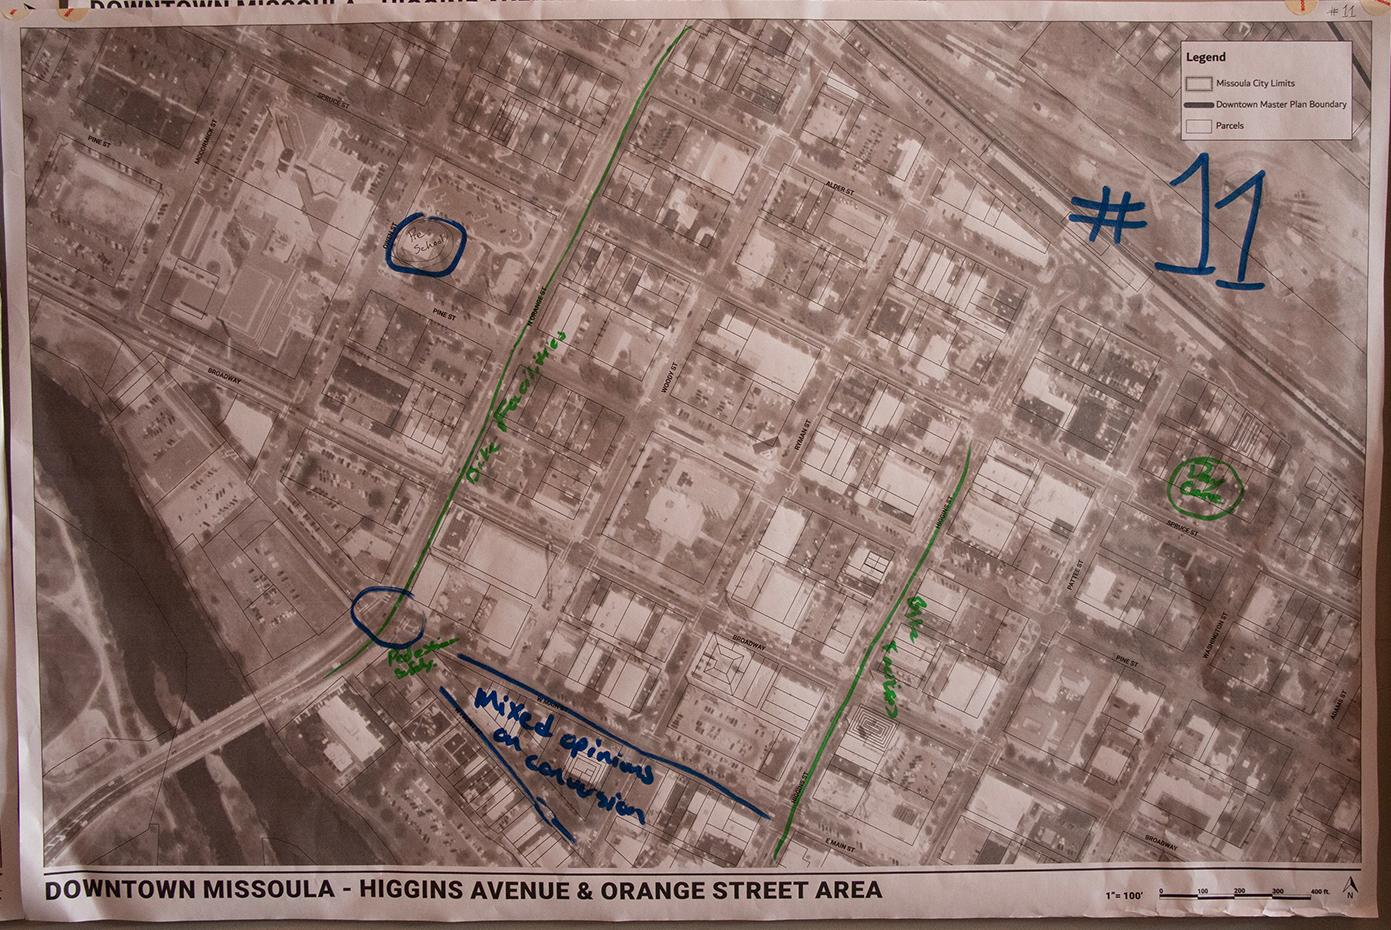 A map of Higgins Avenue & Orange Street Area